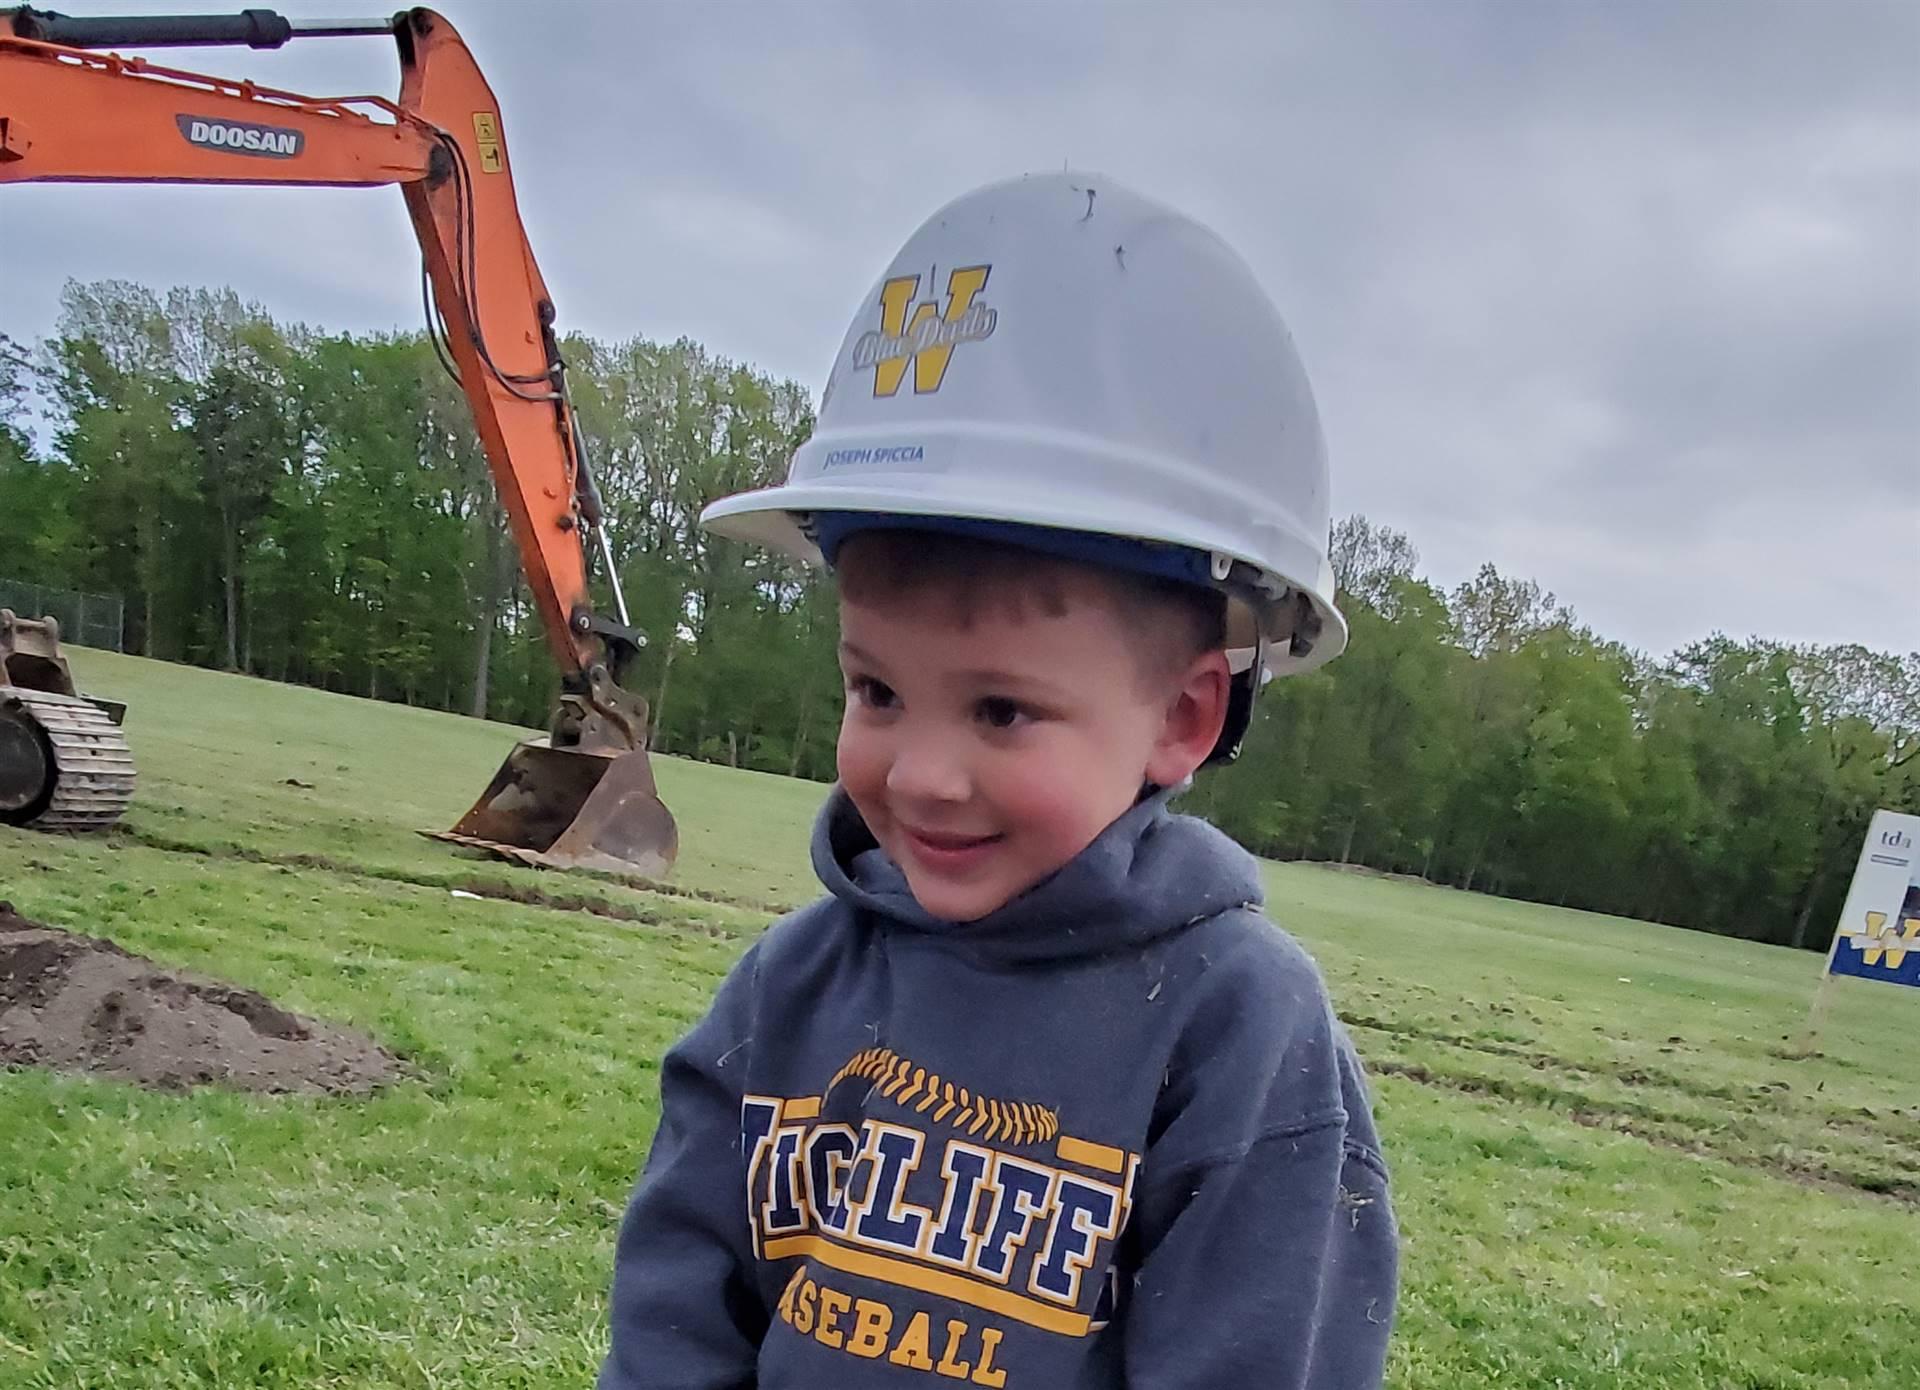 Little Boy at Groundbreaking